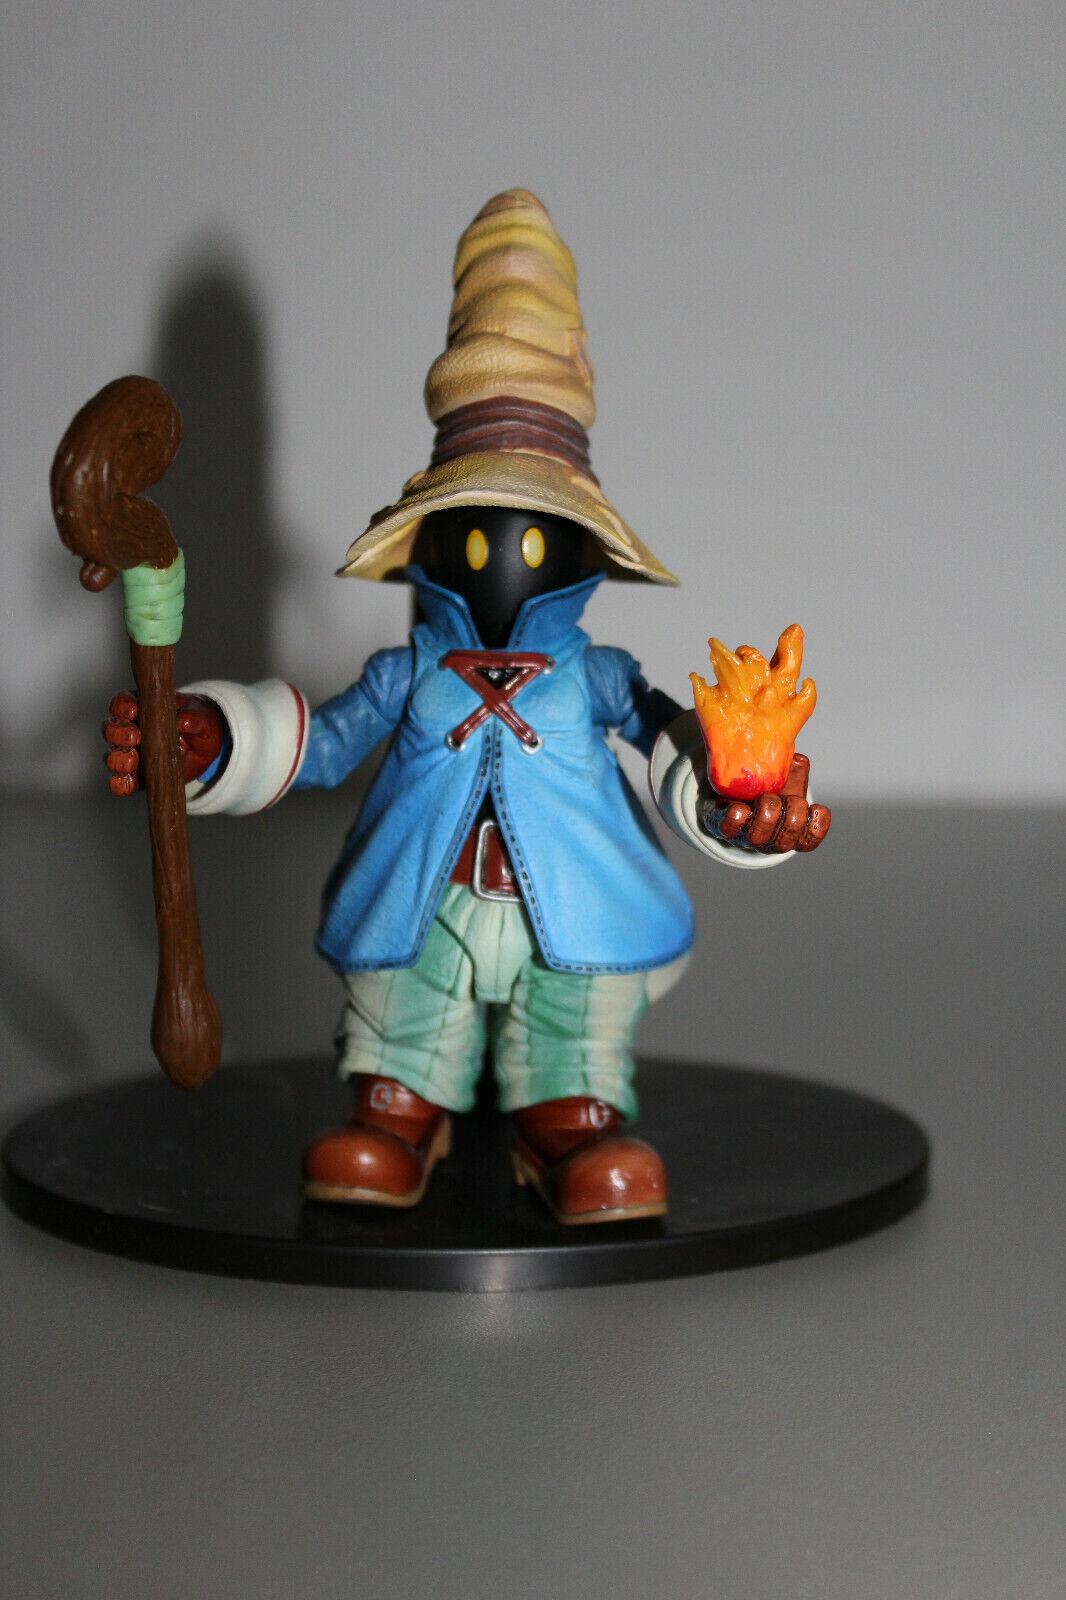 Figurine Final fantasy 9 FF IX Play Arts Kai VIVI Bibi Figure